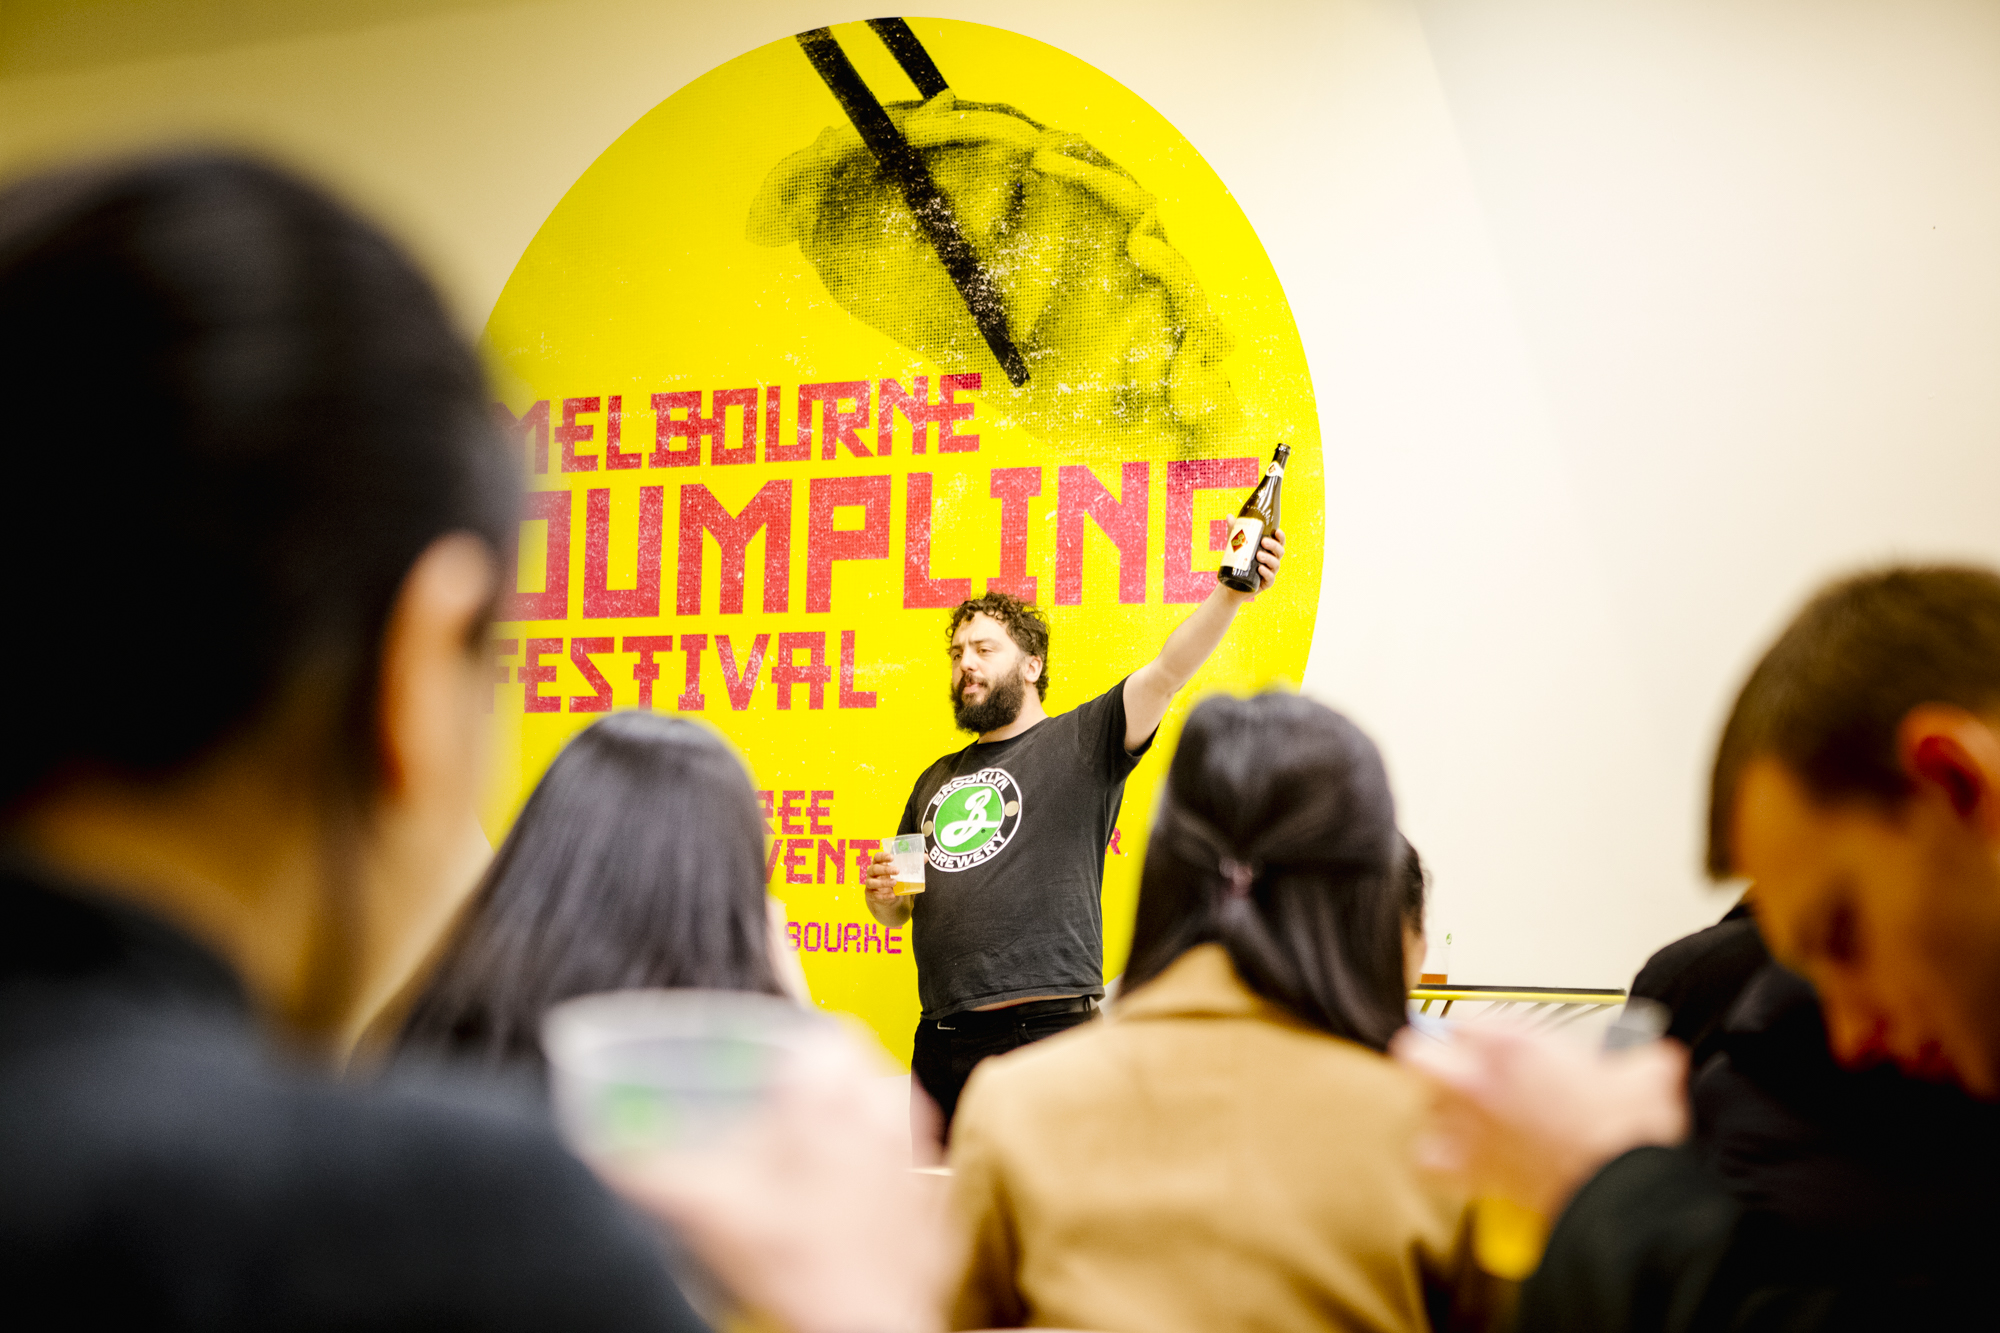 Melbourne Dumpling Festival - ISPT / 206 BOURKE STREET2016